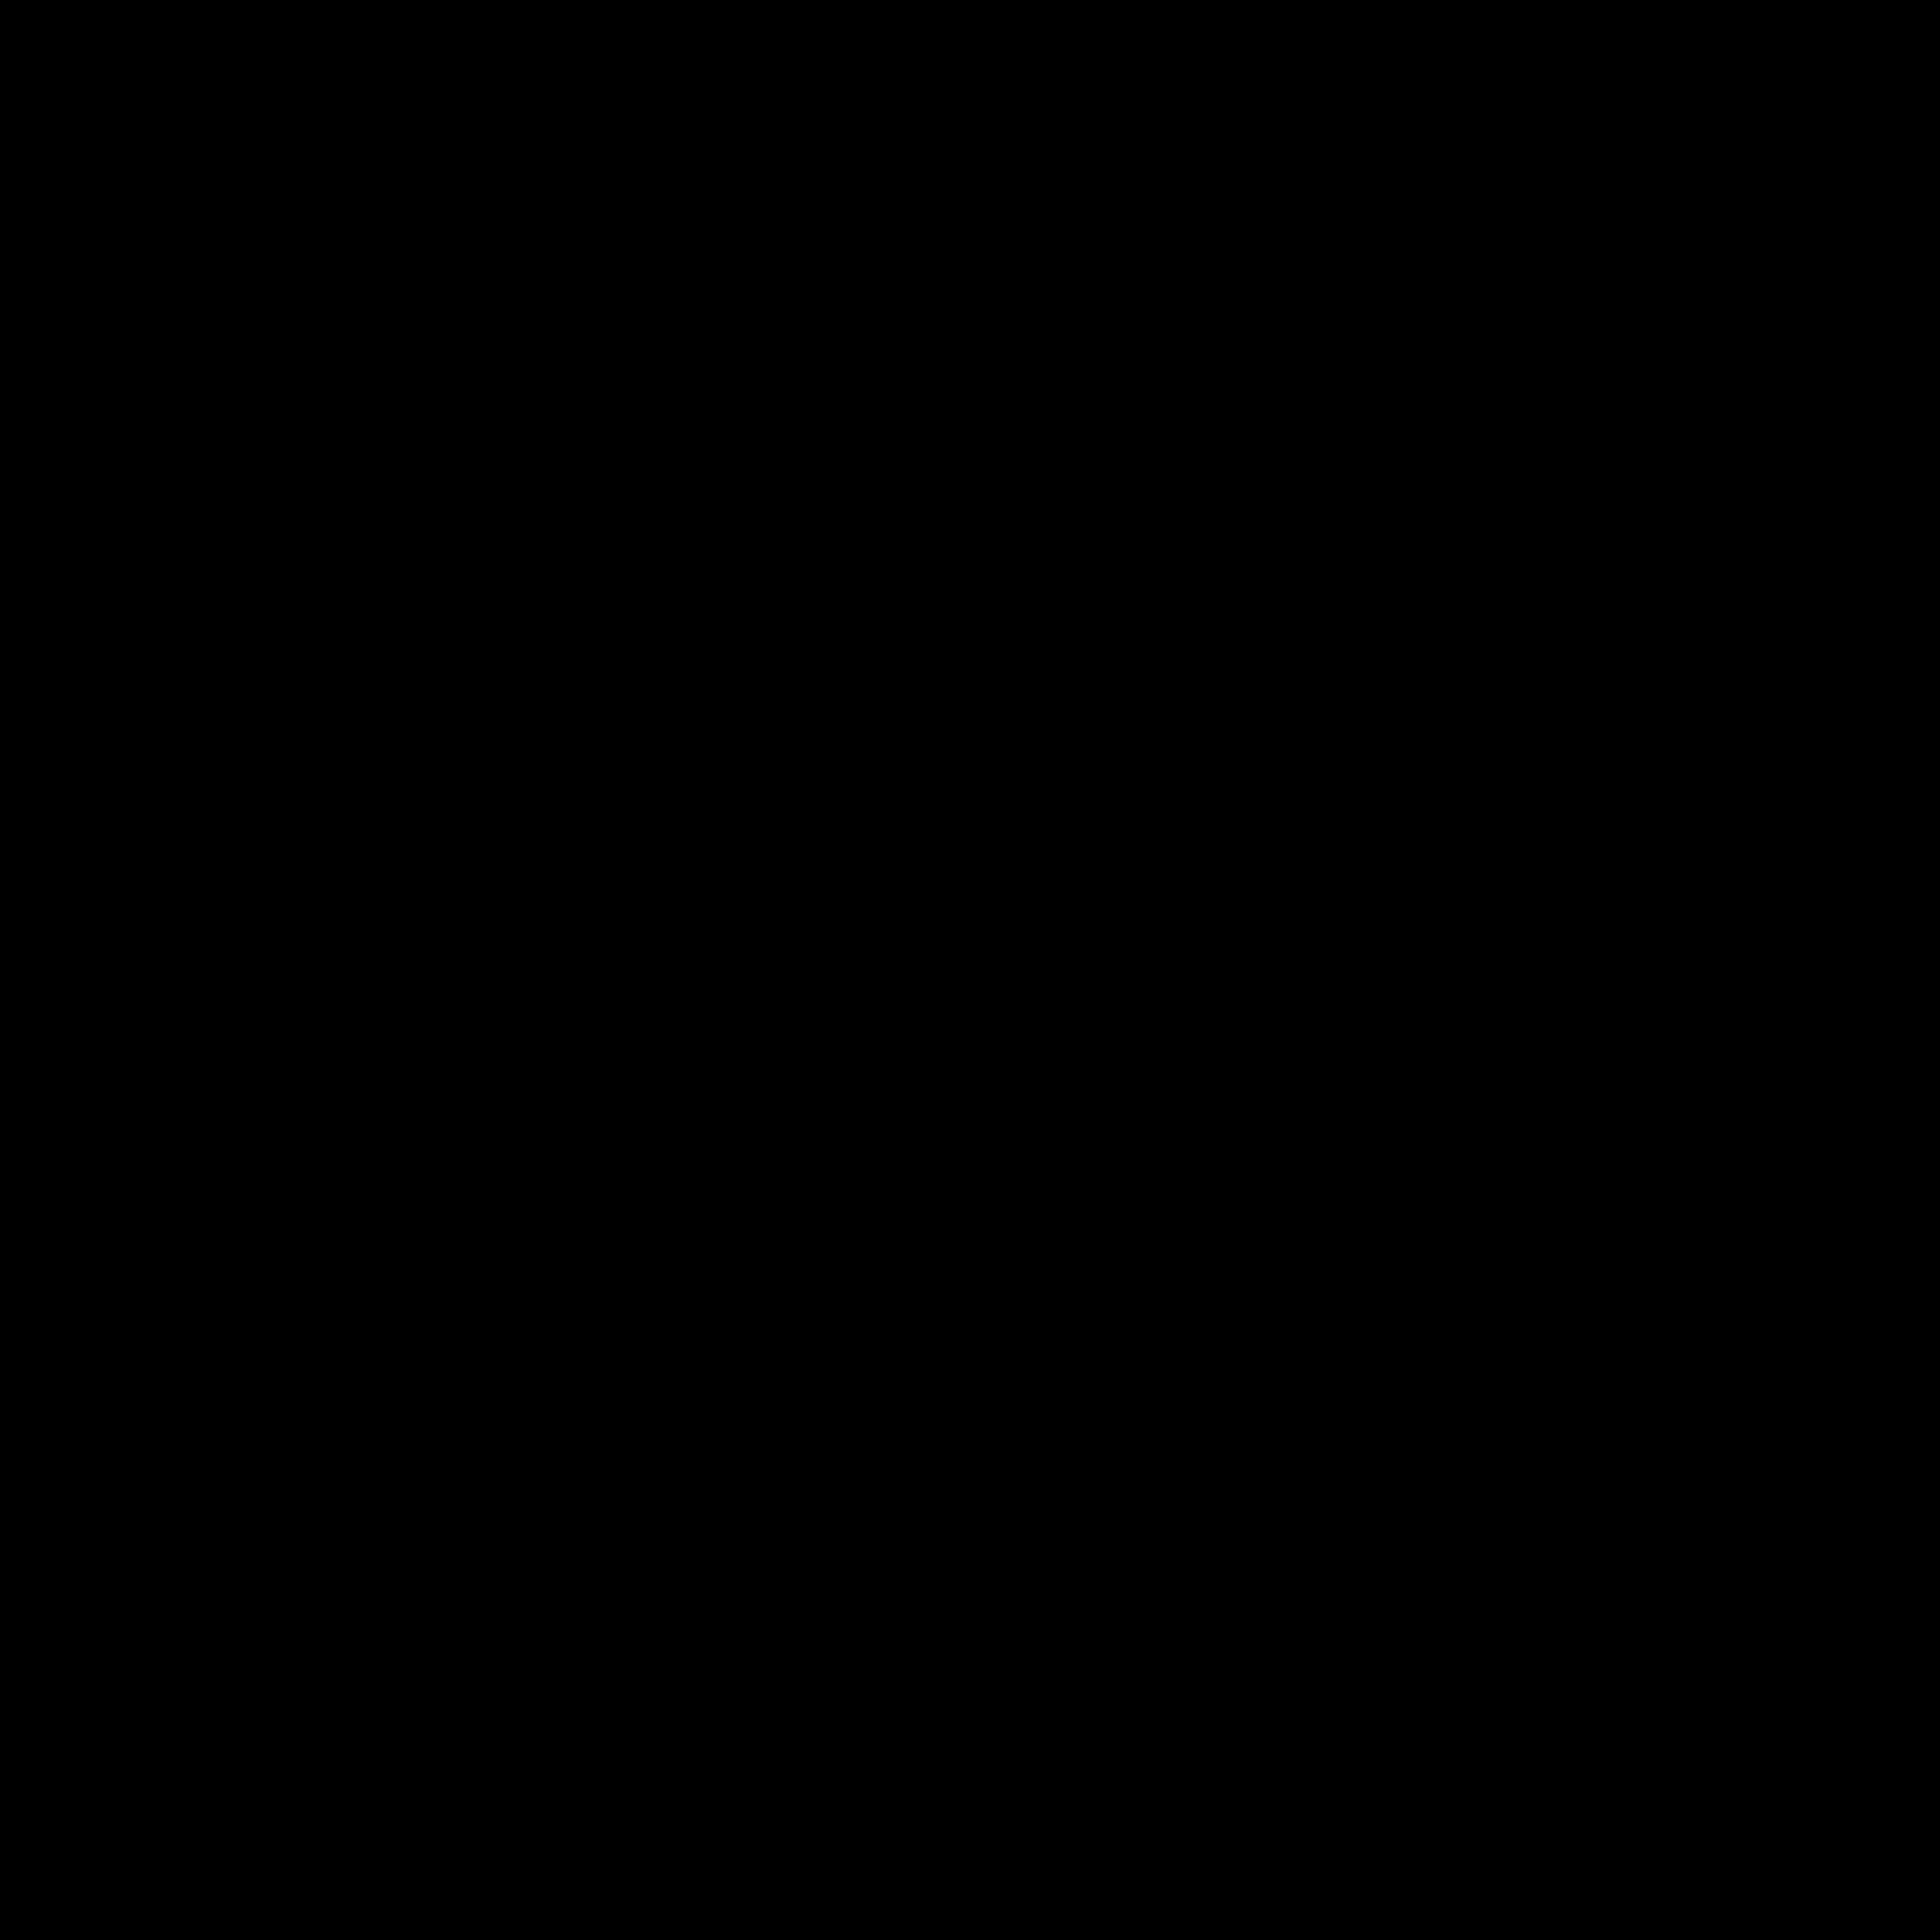 Ferguson Logo PNG Transparent & SVG Vector.